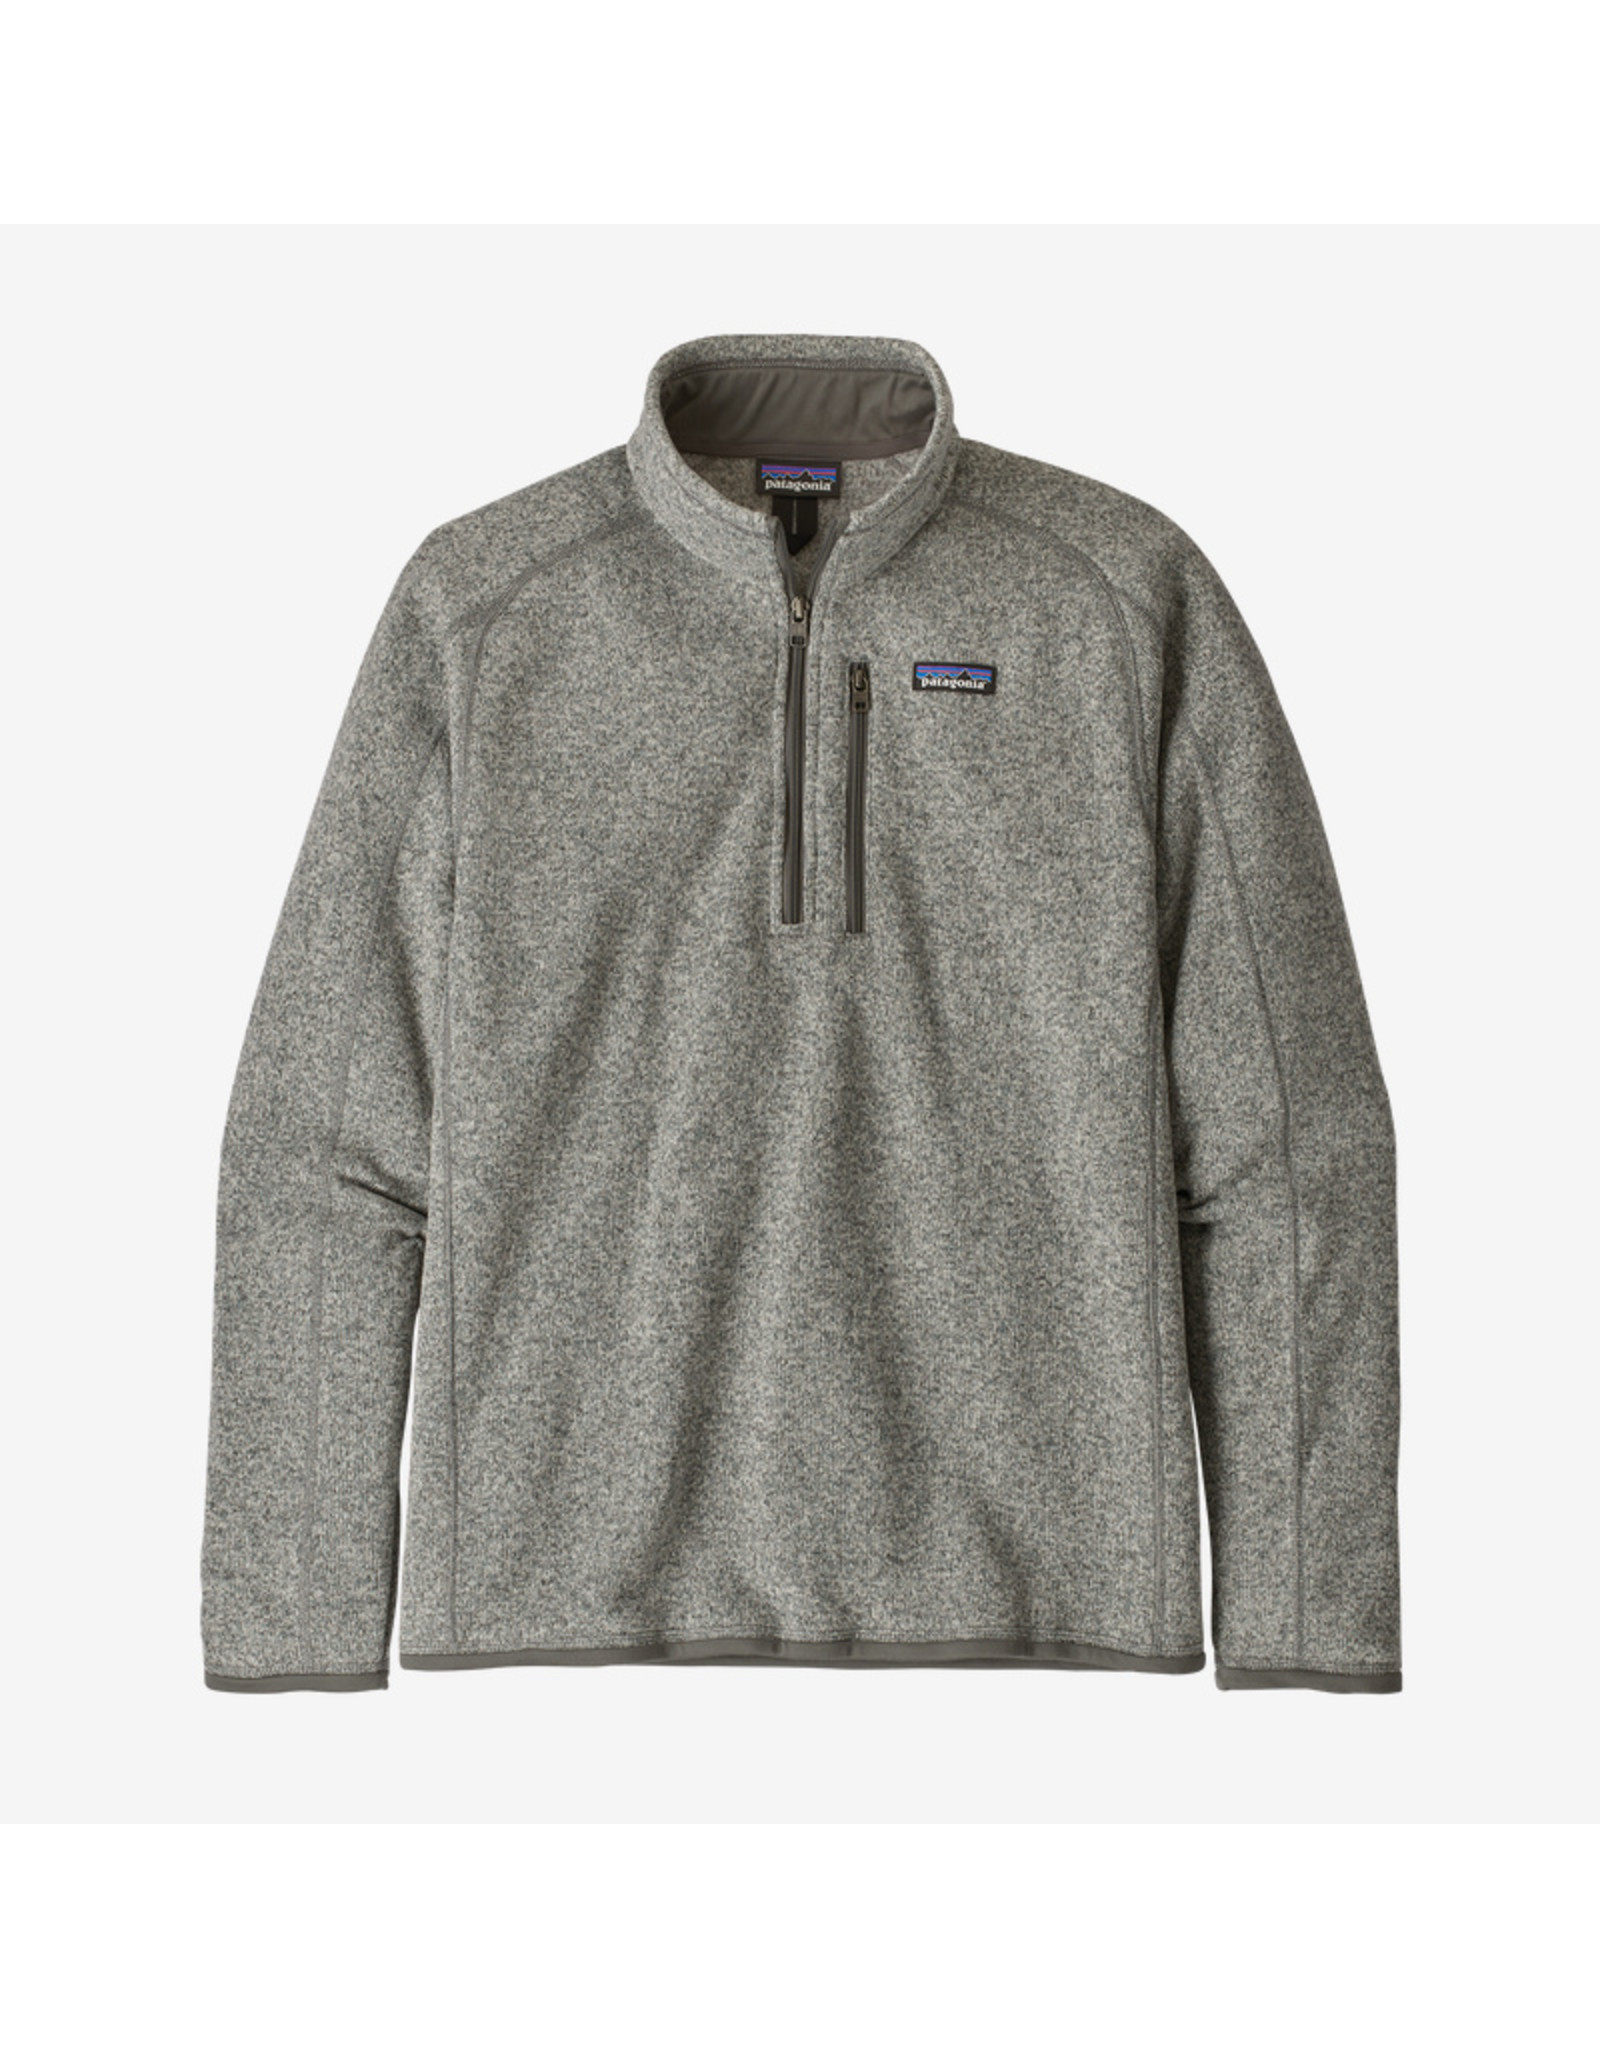 Patagonia Patagonia - Men's Better Sweater® 1/4-Zip Fleece